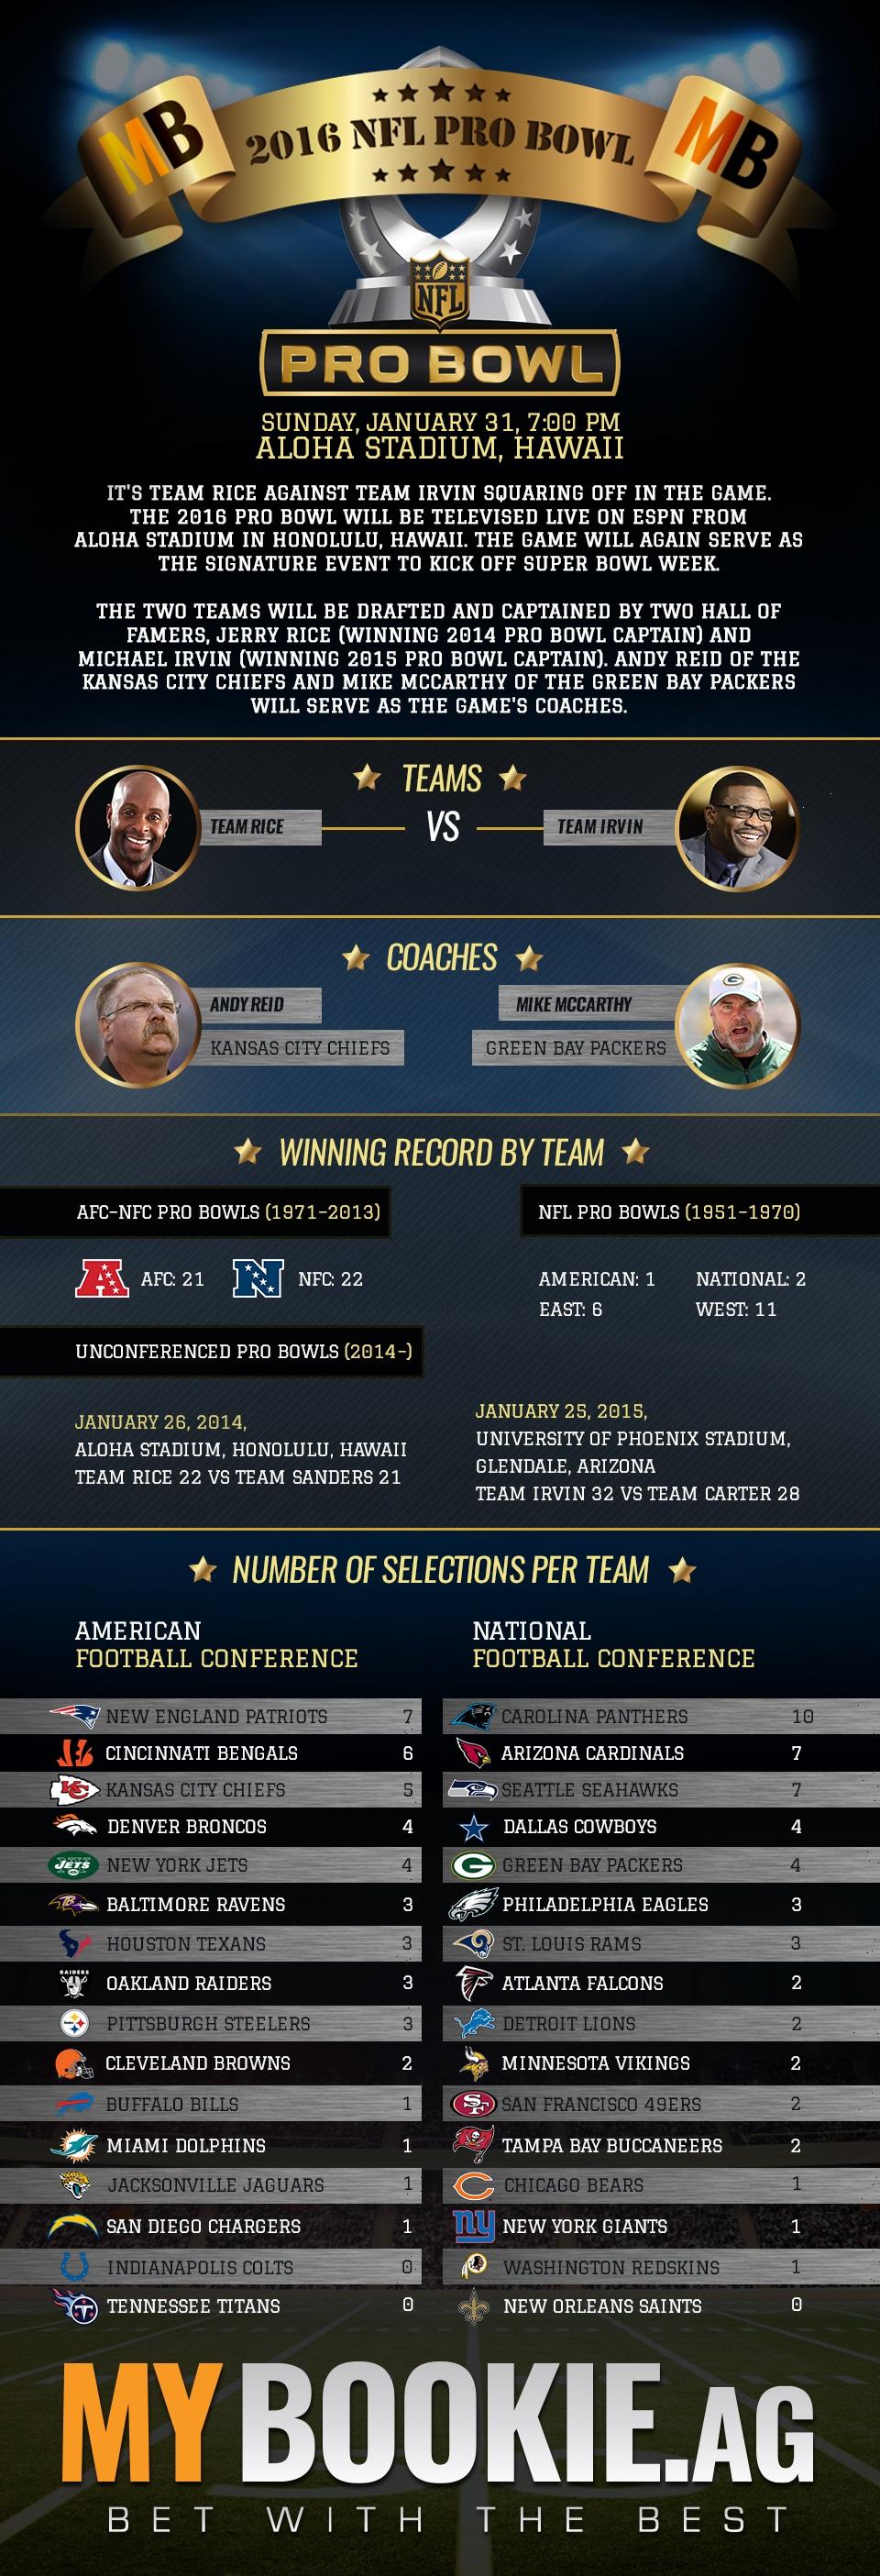 2016 NFL Pro Bowl Team Rice vs Team Irving